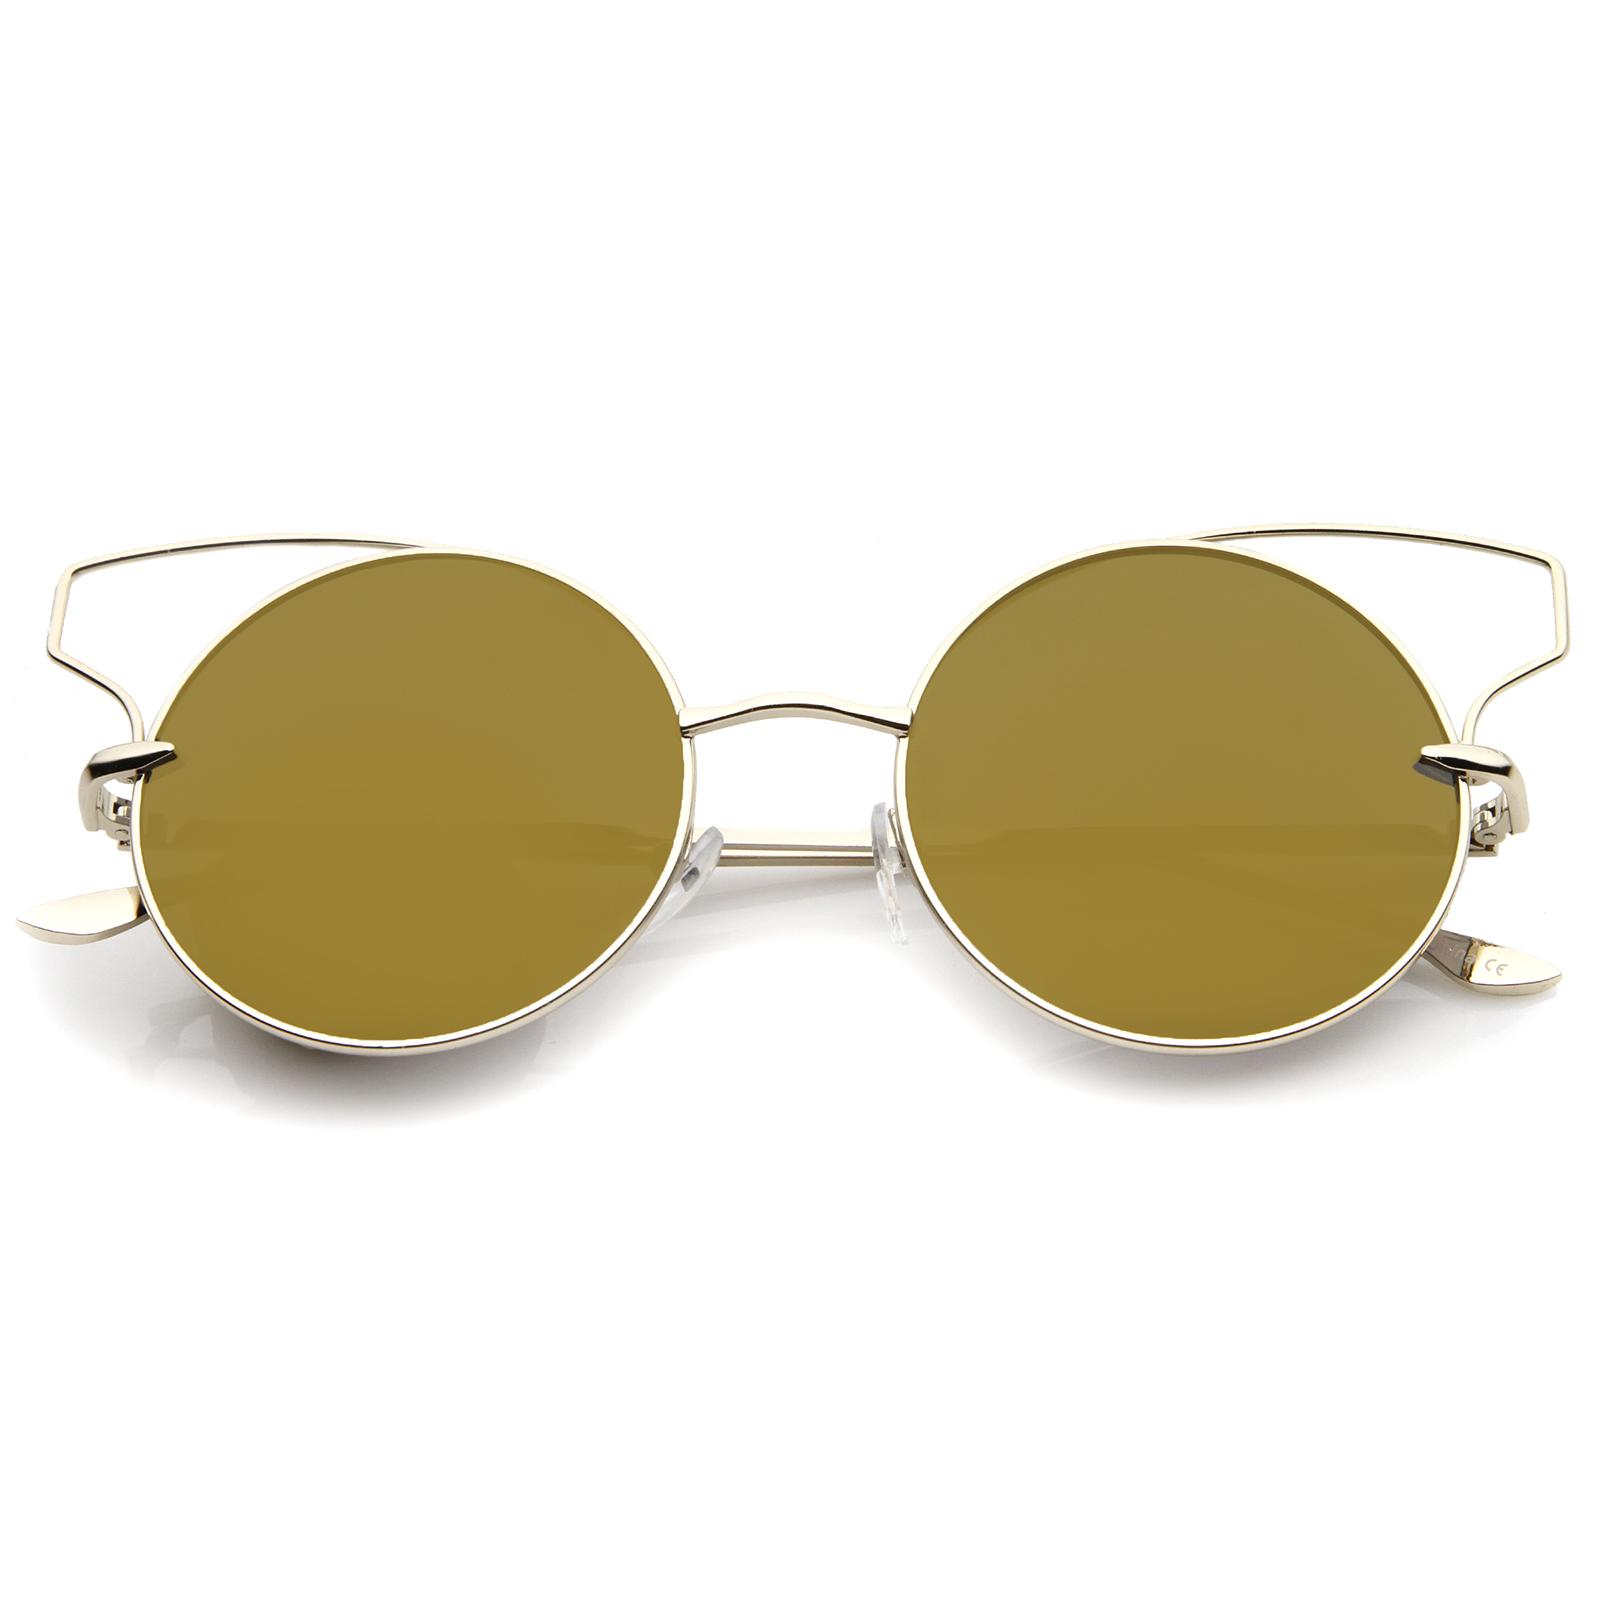 sunglass.LA Wire Open Metal Frame Color Mirror Lens Round Cat Eye ...